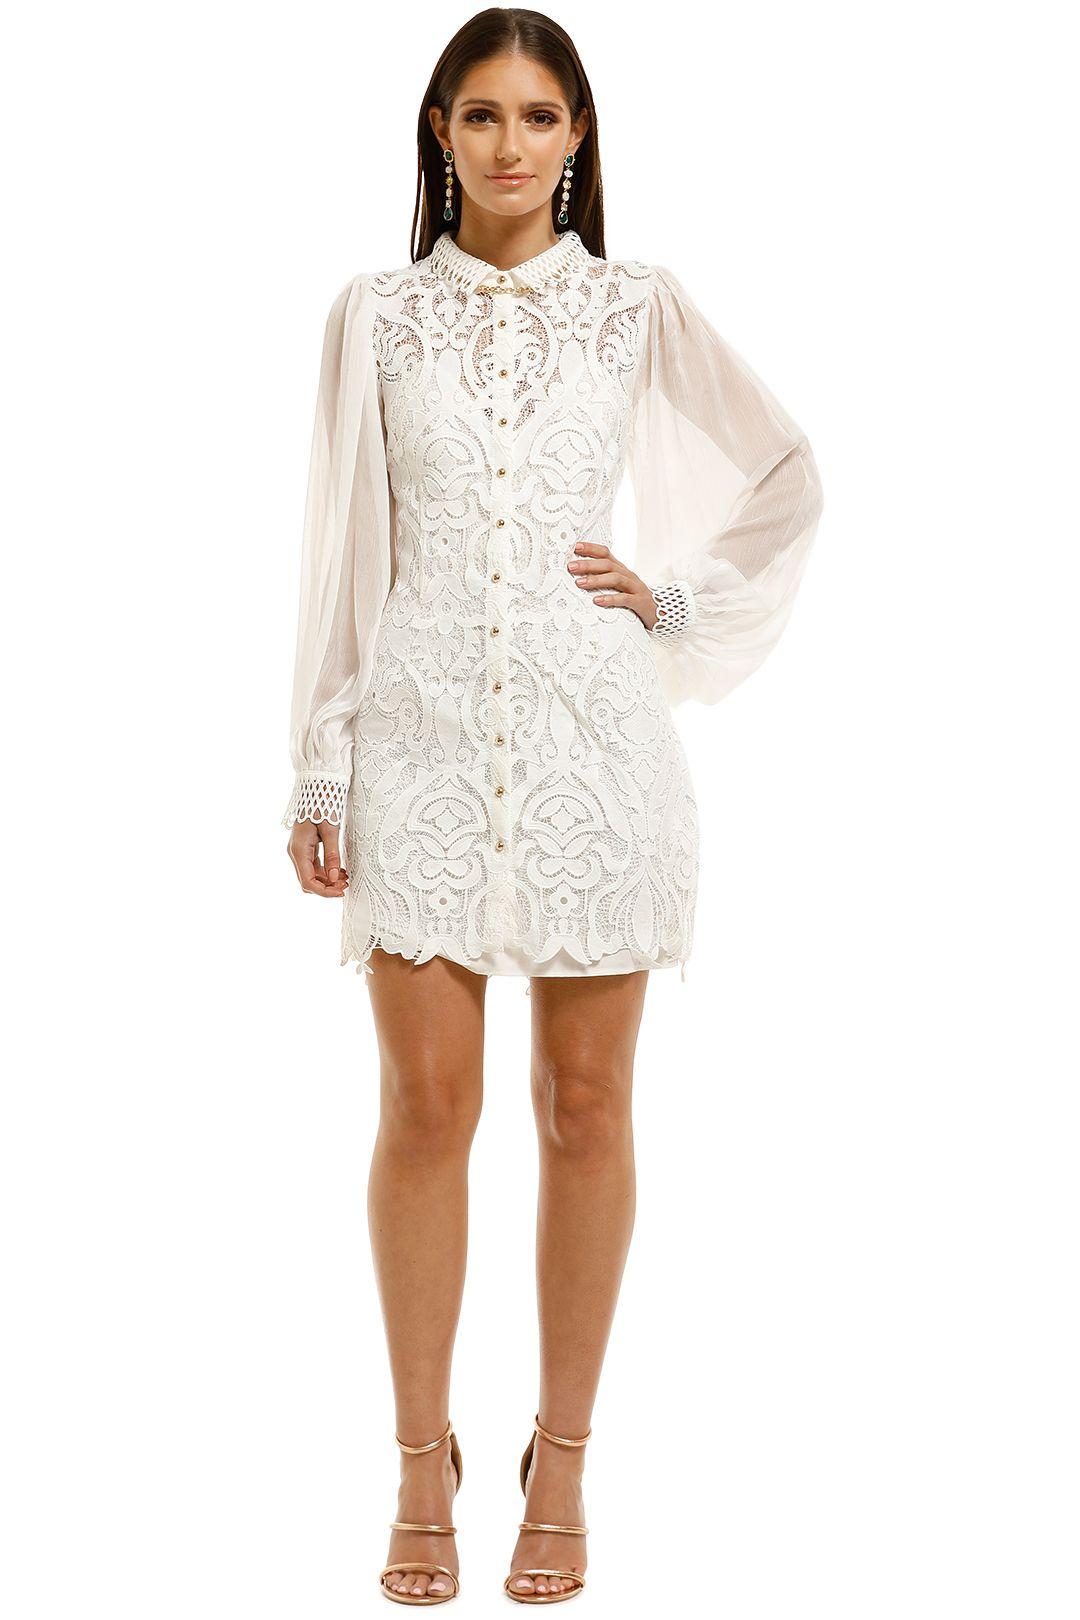 Elliatt-Darcie-Dress-Monochrome-White-Front